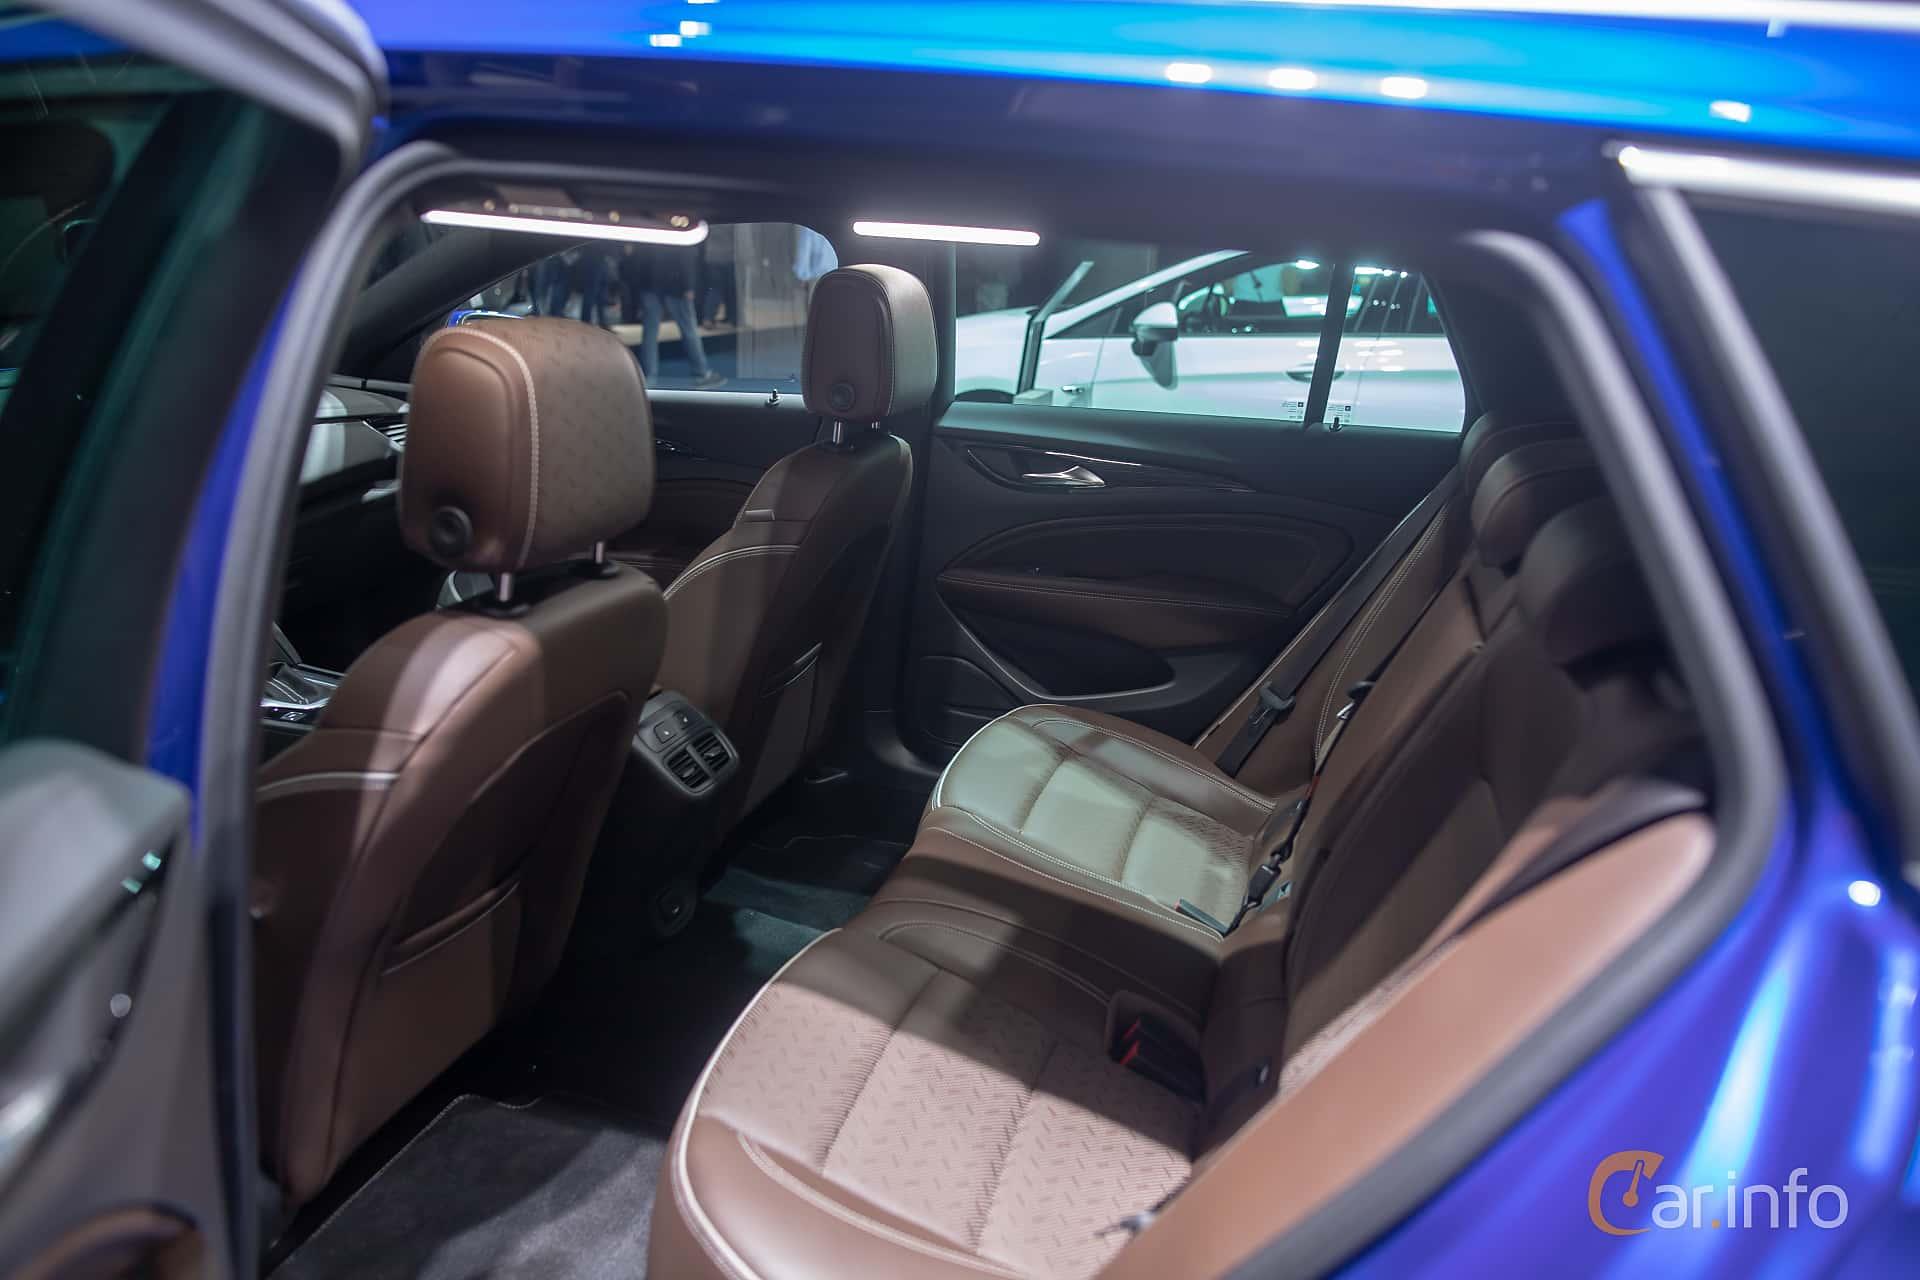 Opel Insignia Sports Tourer 1.5 Turbo Automatic, 165hp, 2020 at IAA 2019